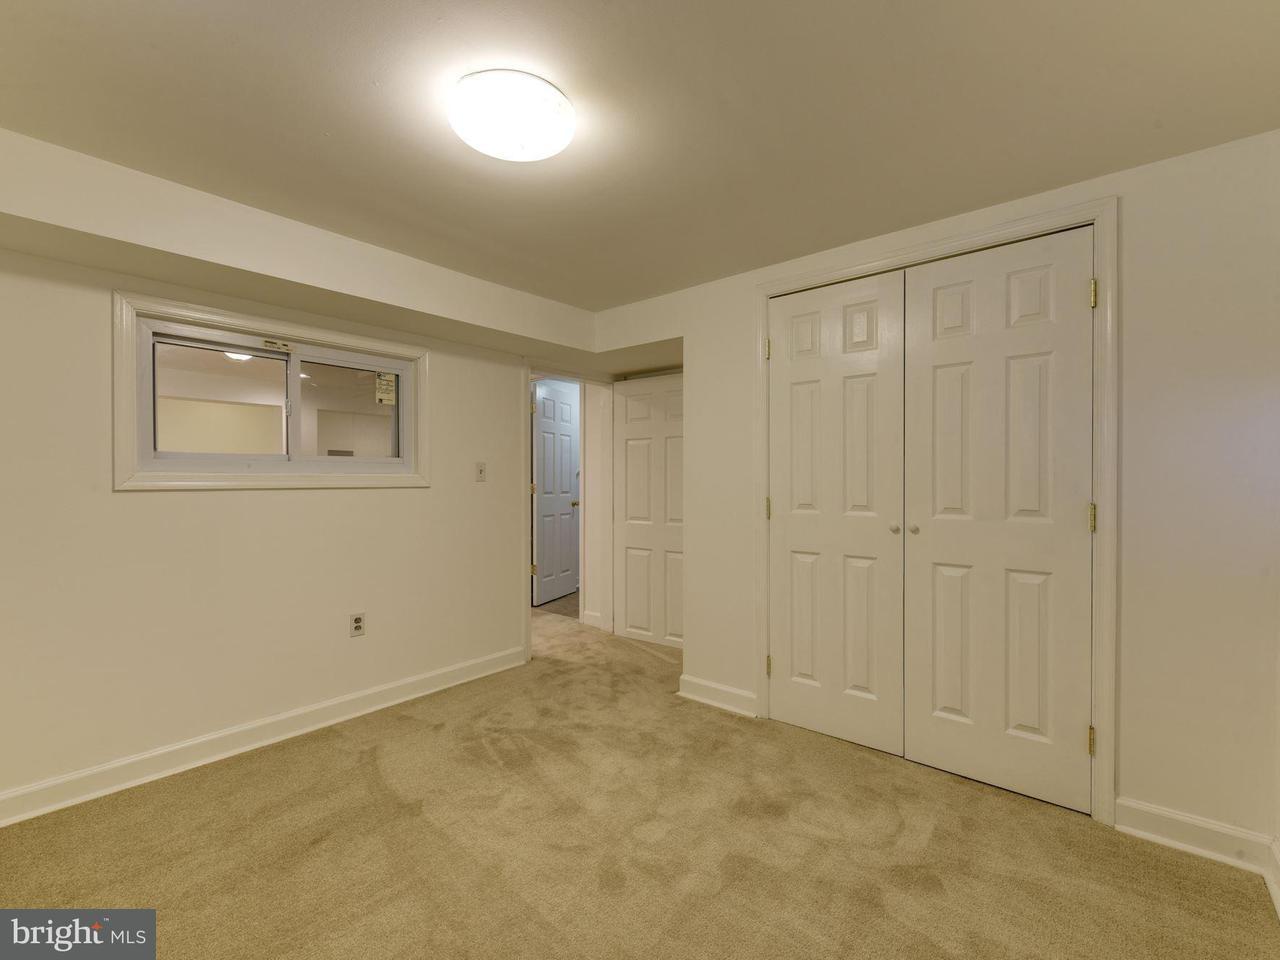 Additional photo for property listing at 10929 Warwick Avenue 10929 Warwick Avenue Fairfax, Virginia 22030 Estados Unidos